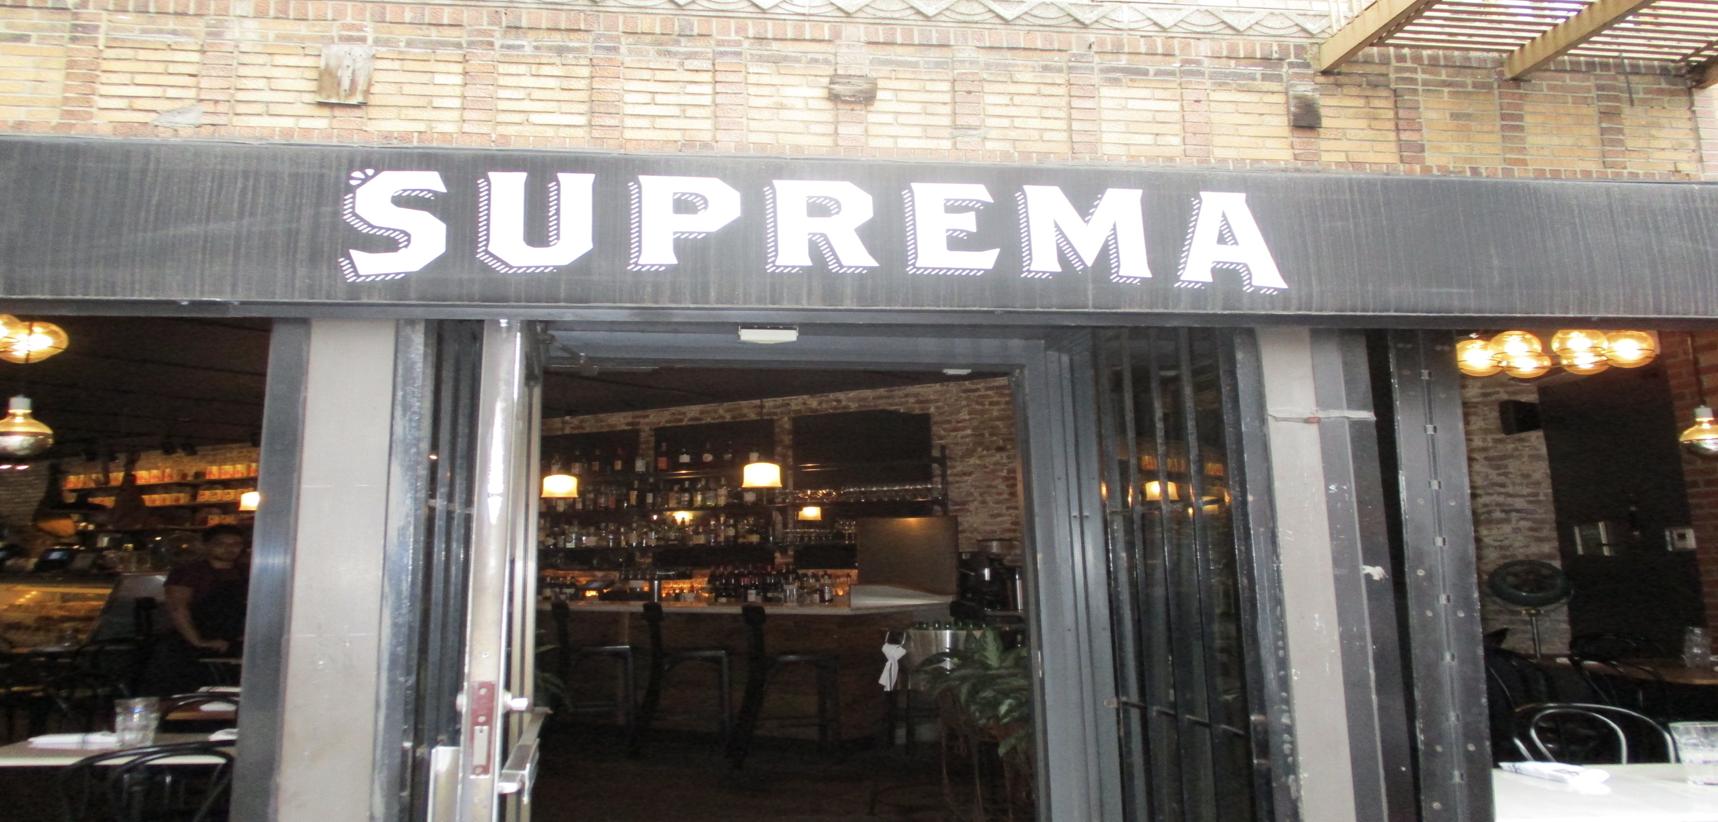 Suprema storefront on Bleeker Street